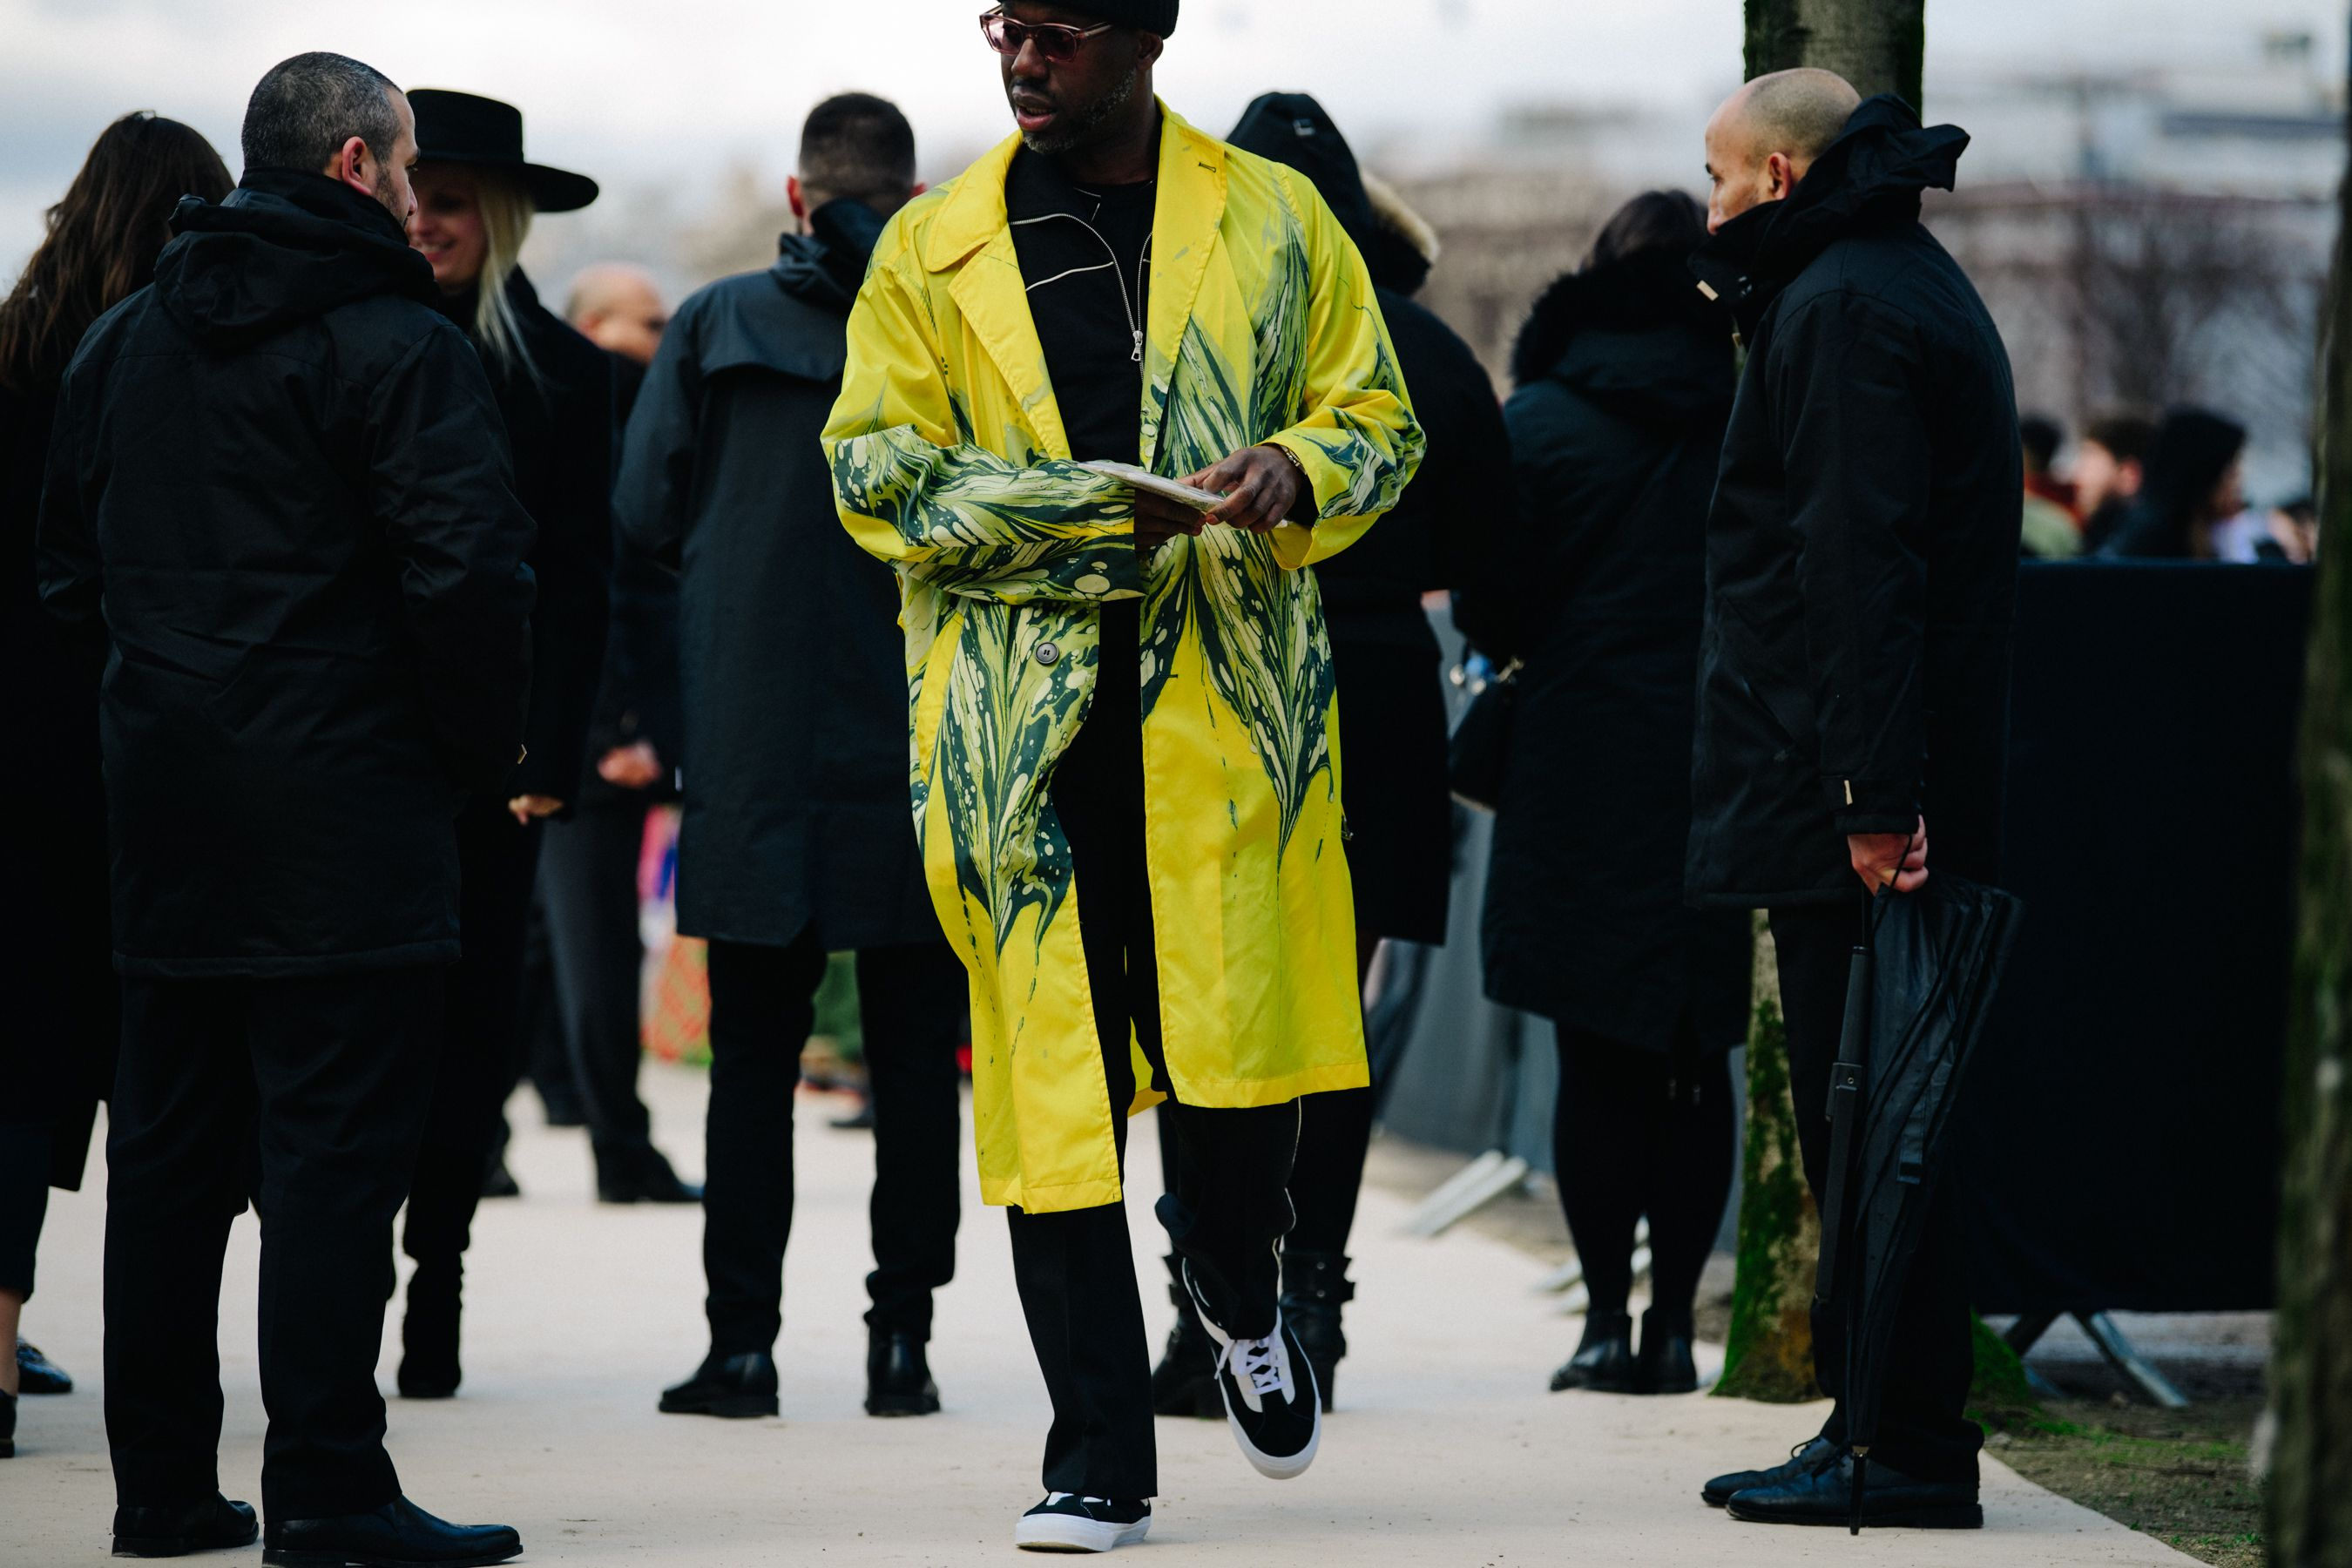 Man Wearing Yellow Coat Marcus Paul Paris